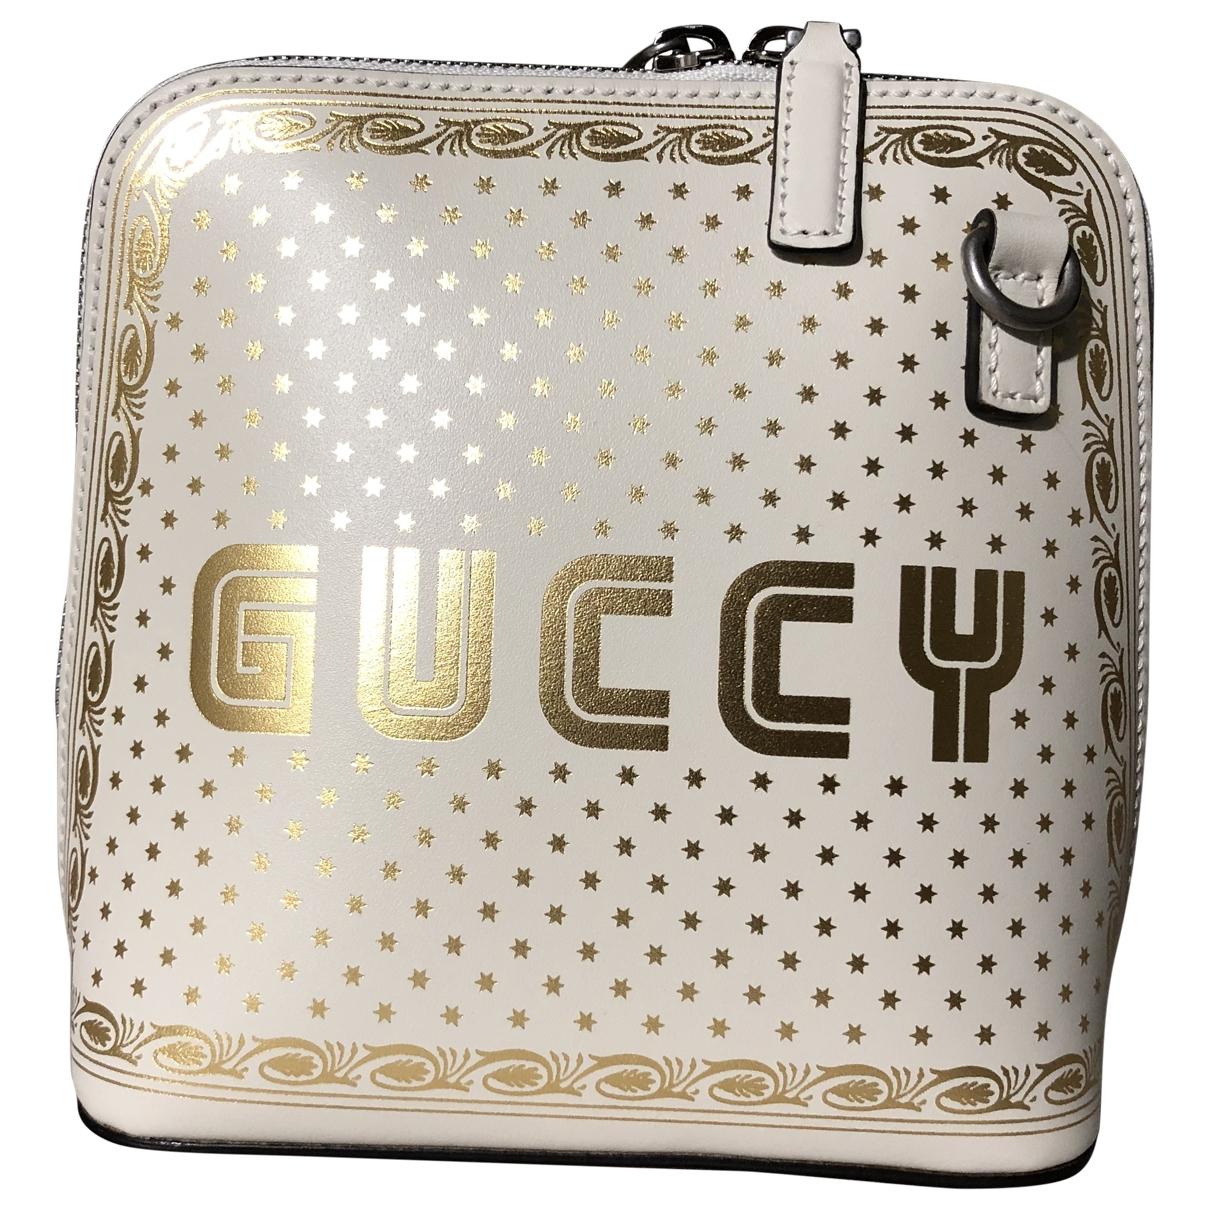 Gucci Guccy minibag Handtasche in  Weiss Leder